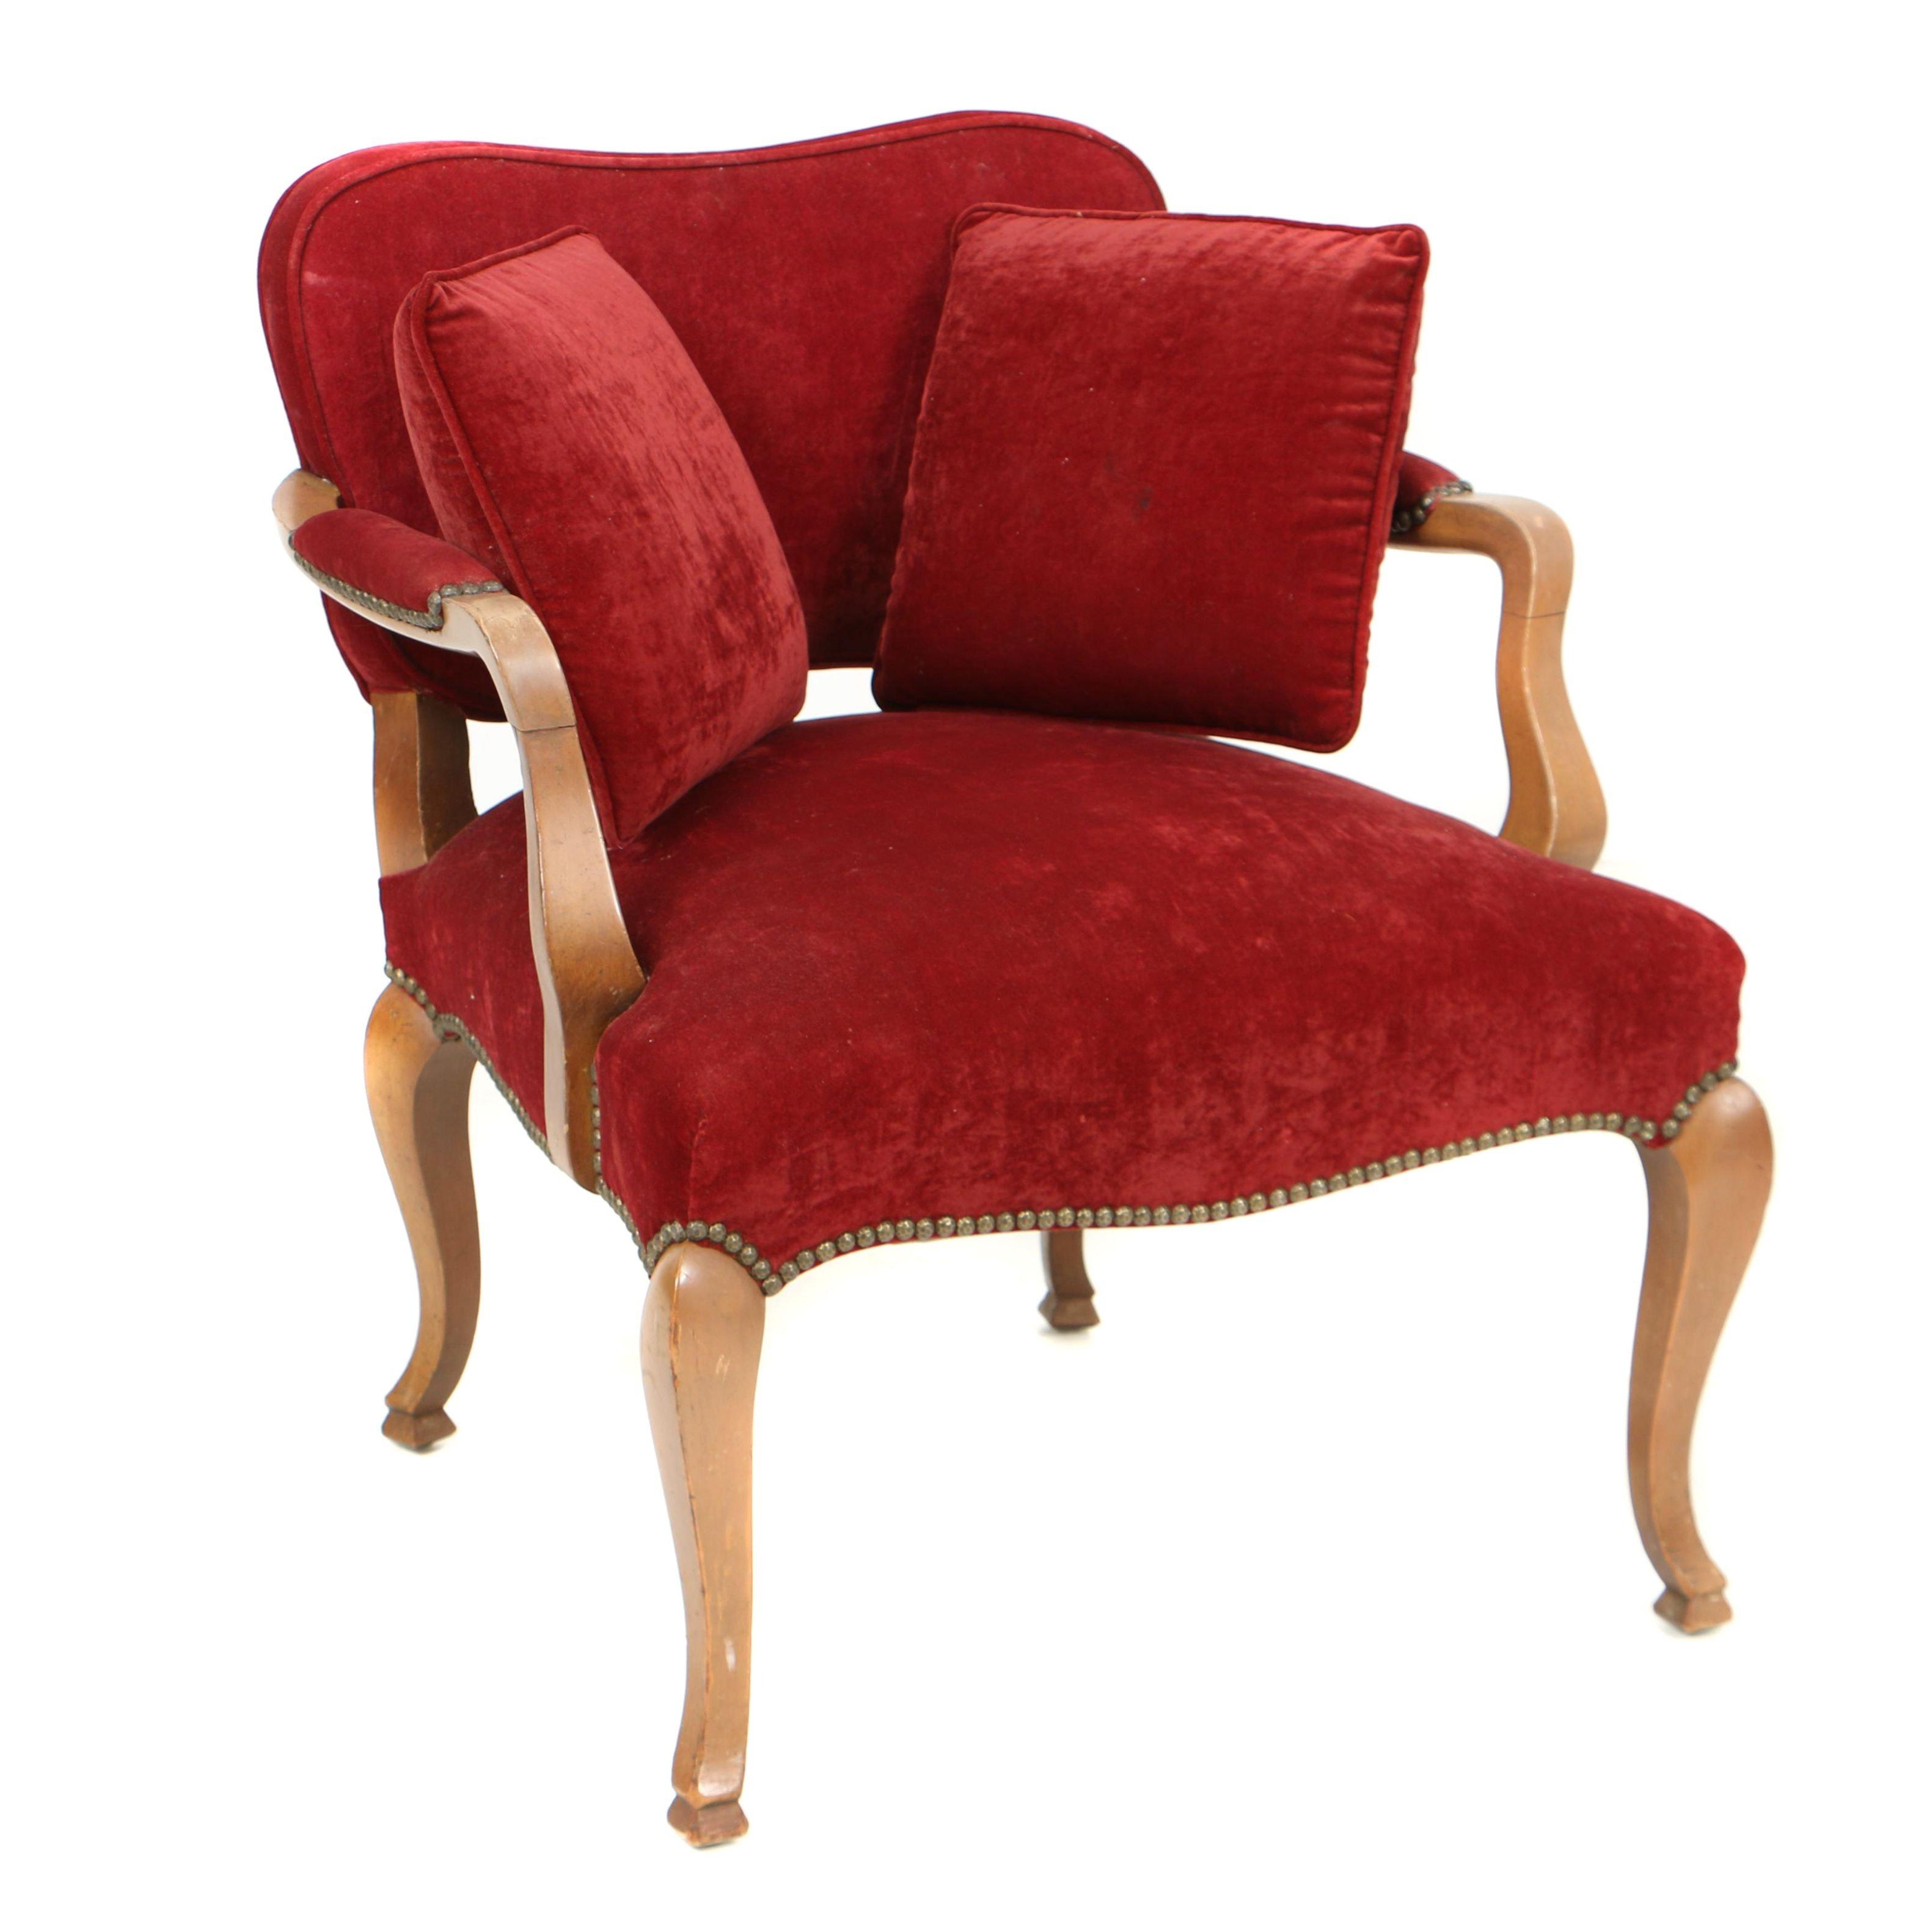 Vintage Provincial Louis XV Style Low-Back Fauteuil